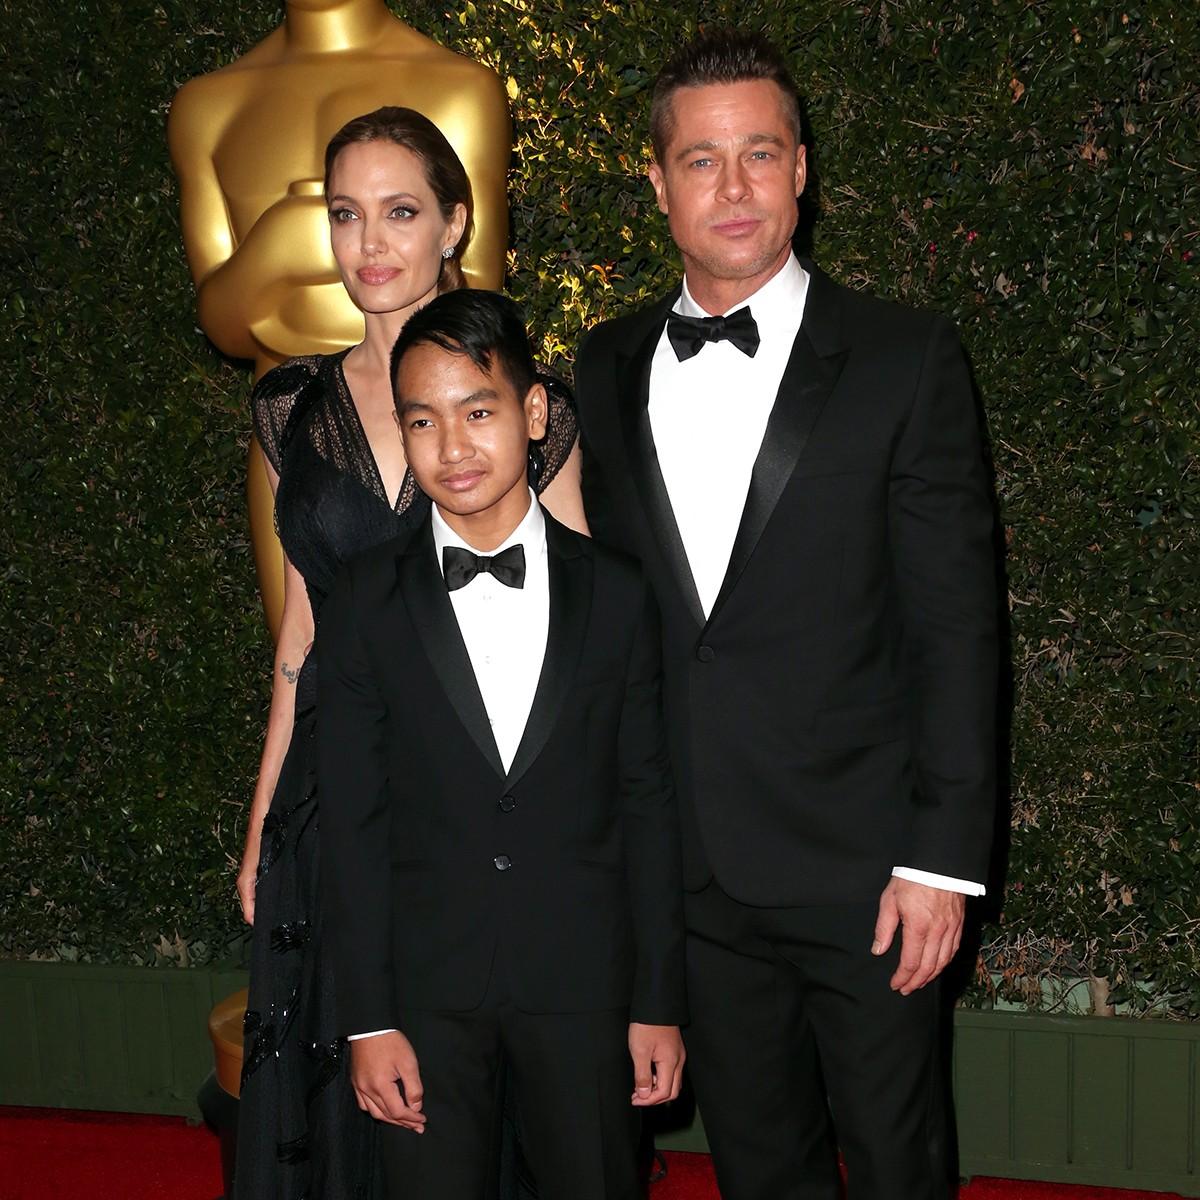 Angelina Jolie e Brad Pitt se inspiraram nos locais de nascimento de Shiloh Nouvel, Maddox Chivan, Zahara Marley, Pax Thien, Knox Leon e Vivienne Marcheline (Foto: Getty Images)